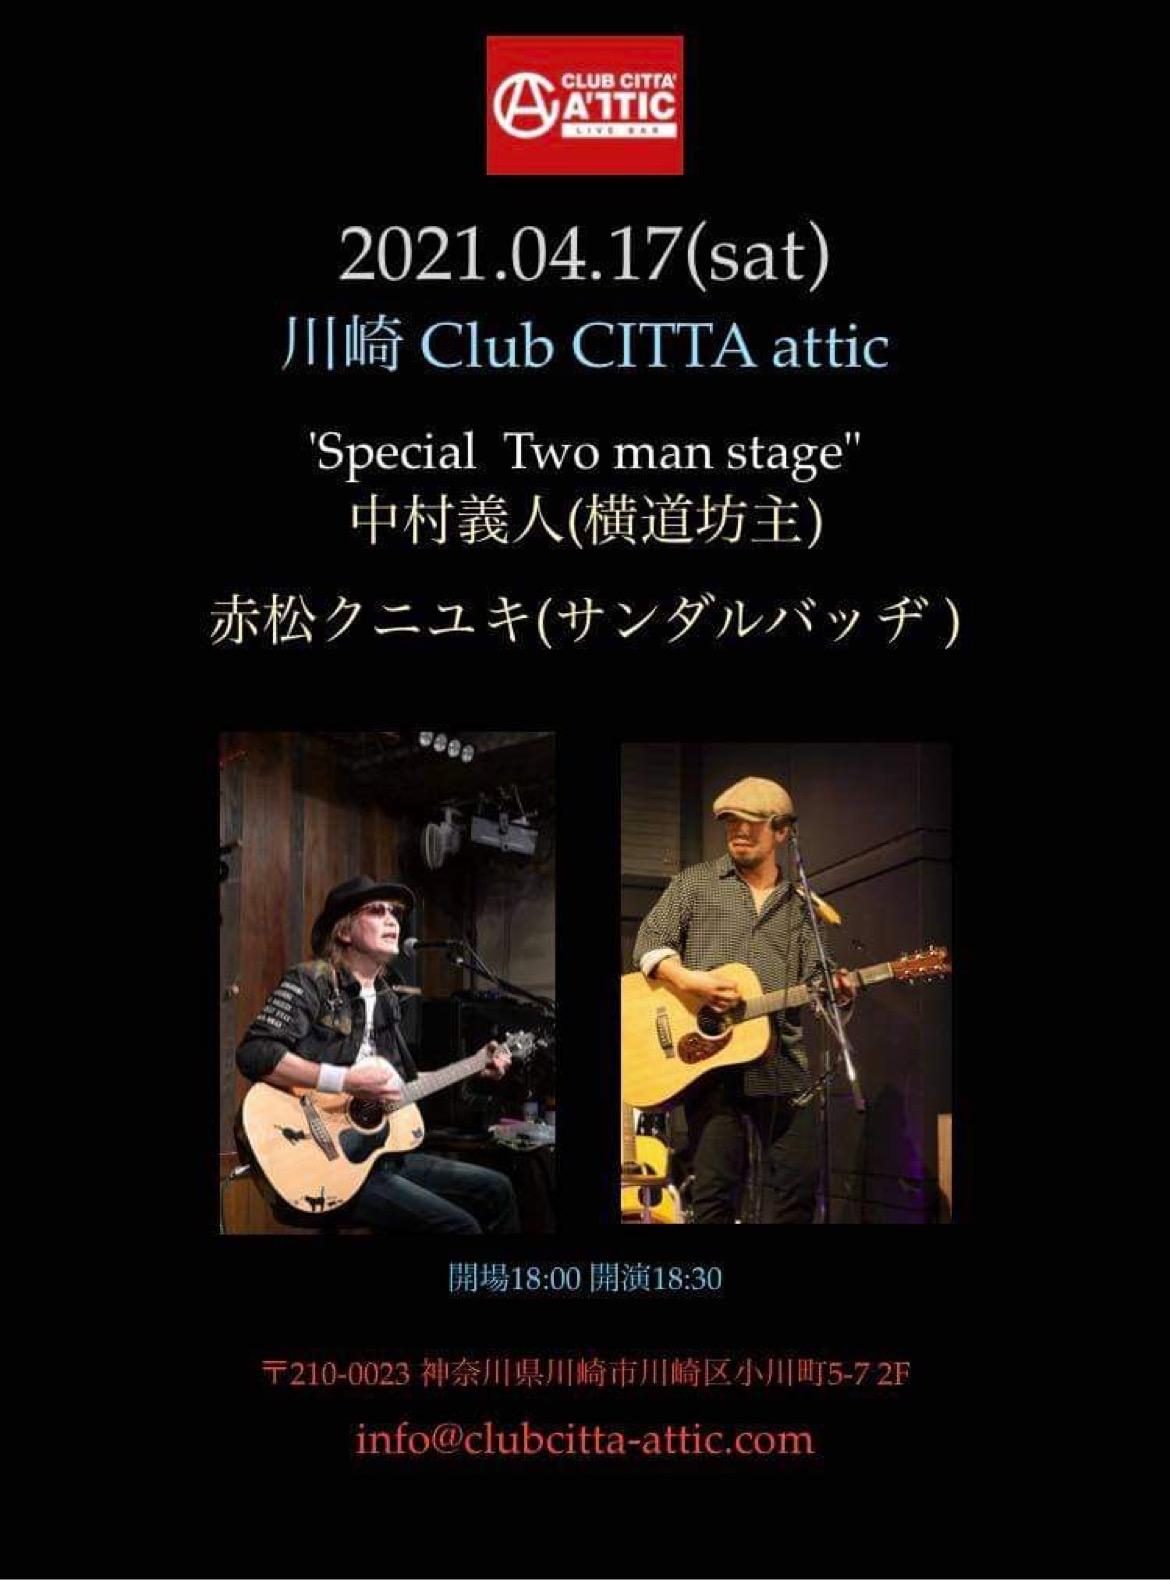 Special Two man stage 中村義人(横道坊主) 赤松クニユキ(サンダルバッヂ )